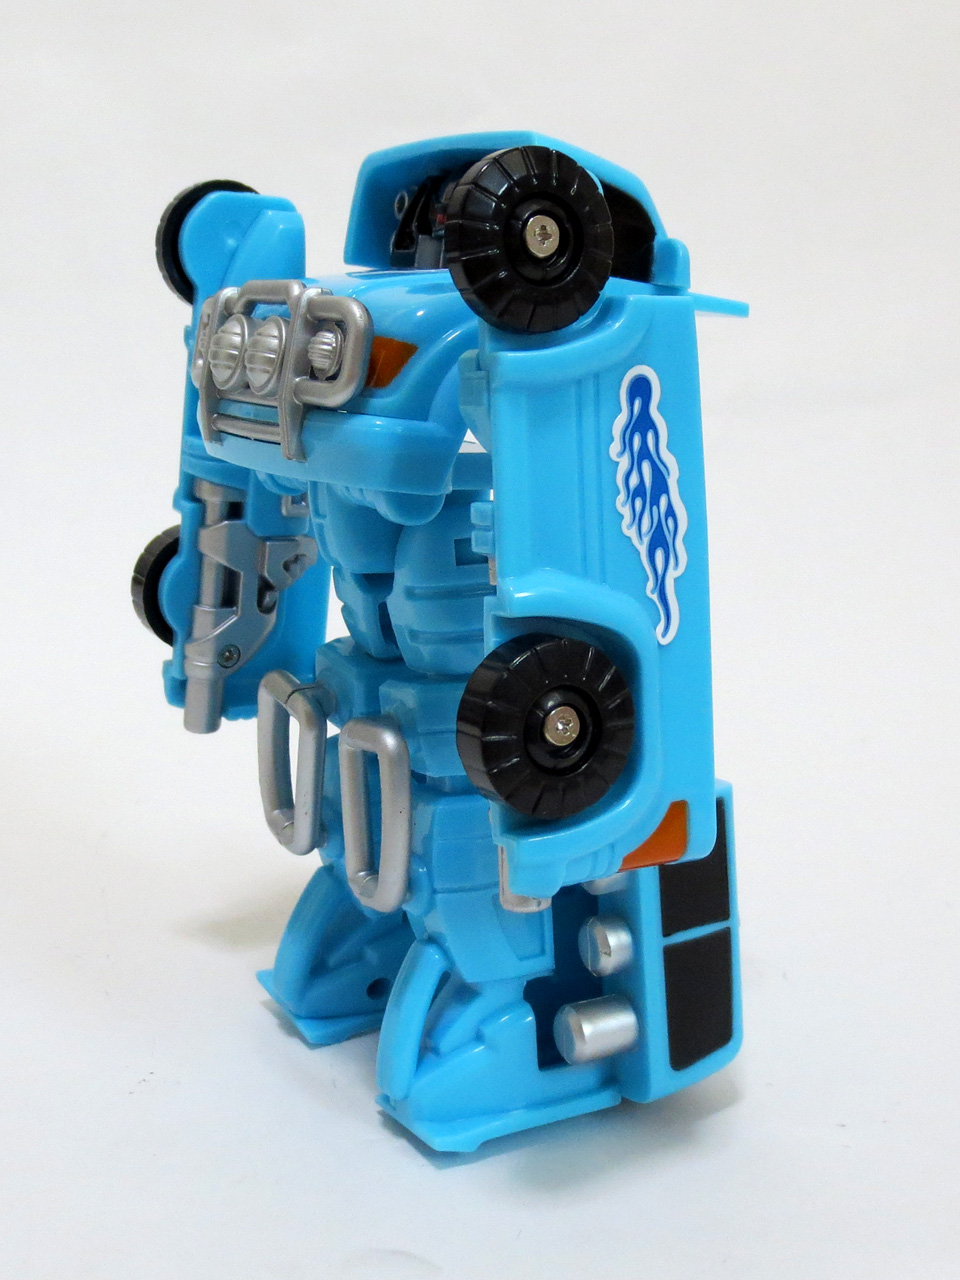 Robo_max_4wd_type_15.jpg